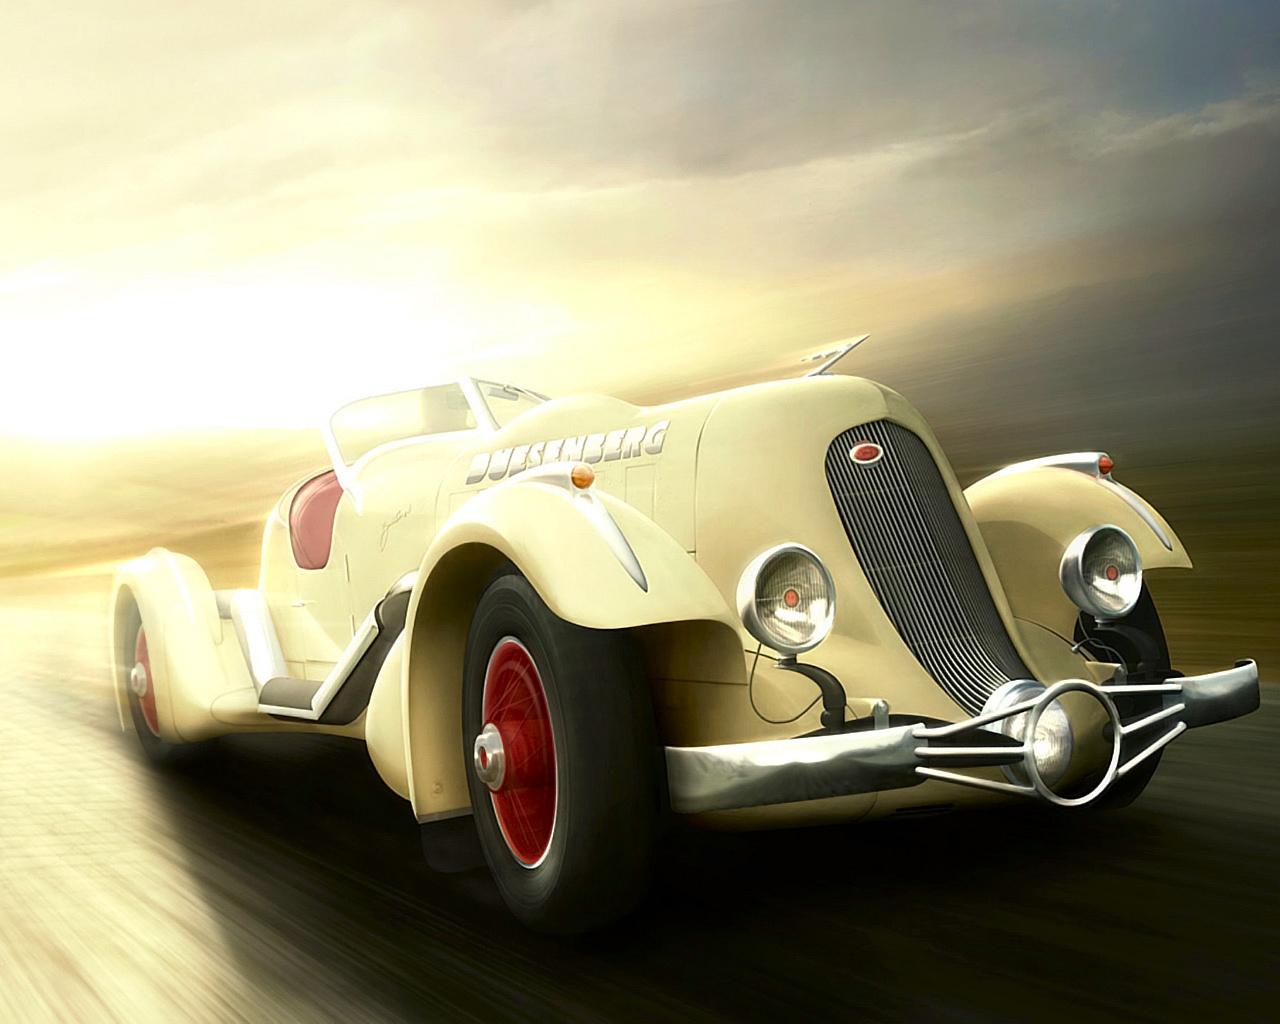 Classic <b>Car</b> Artwork | <b>Vintage</b> and Classic <b>Cars</b> HD <b>Wallpapers</b> | HD ...